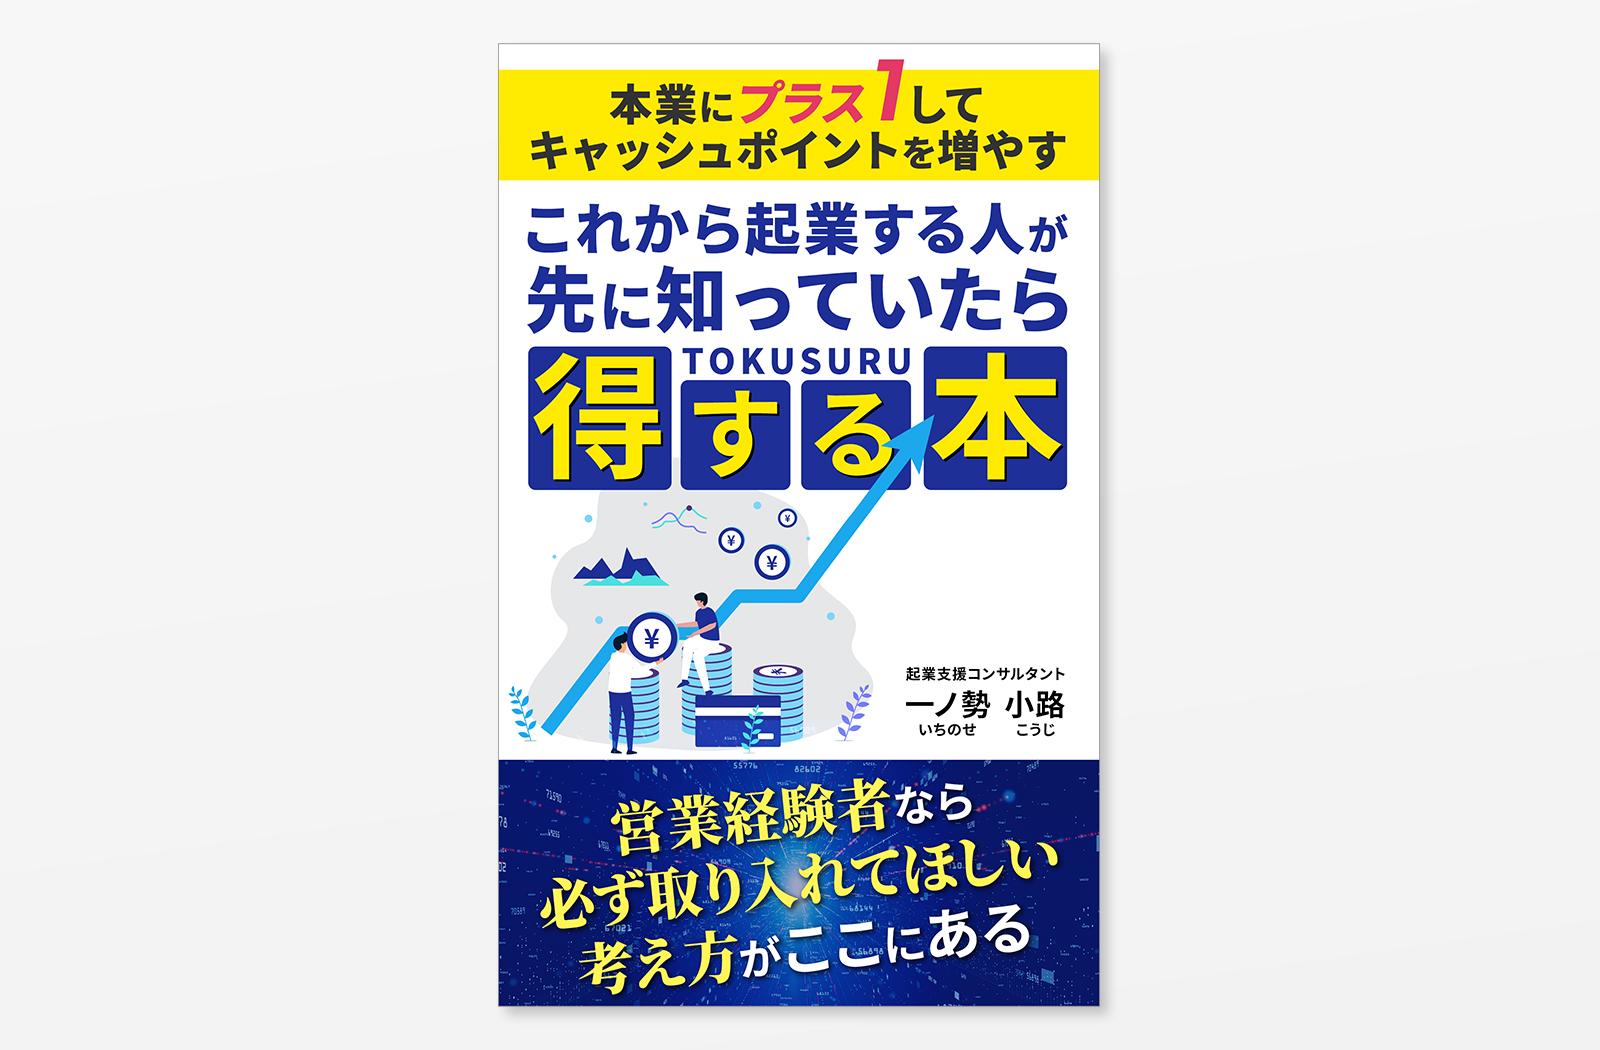 Kindle電子書籍「これから起業する人が先に知っていたら得する本」の表紙デザイン